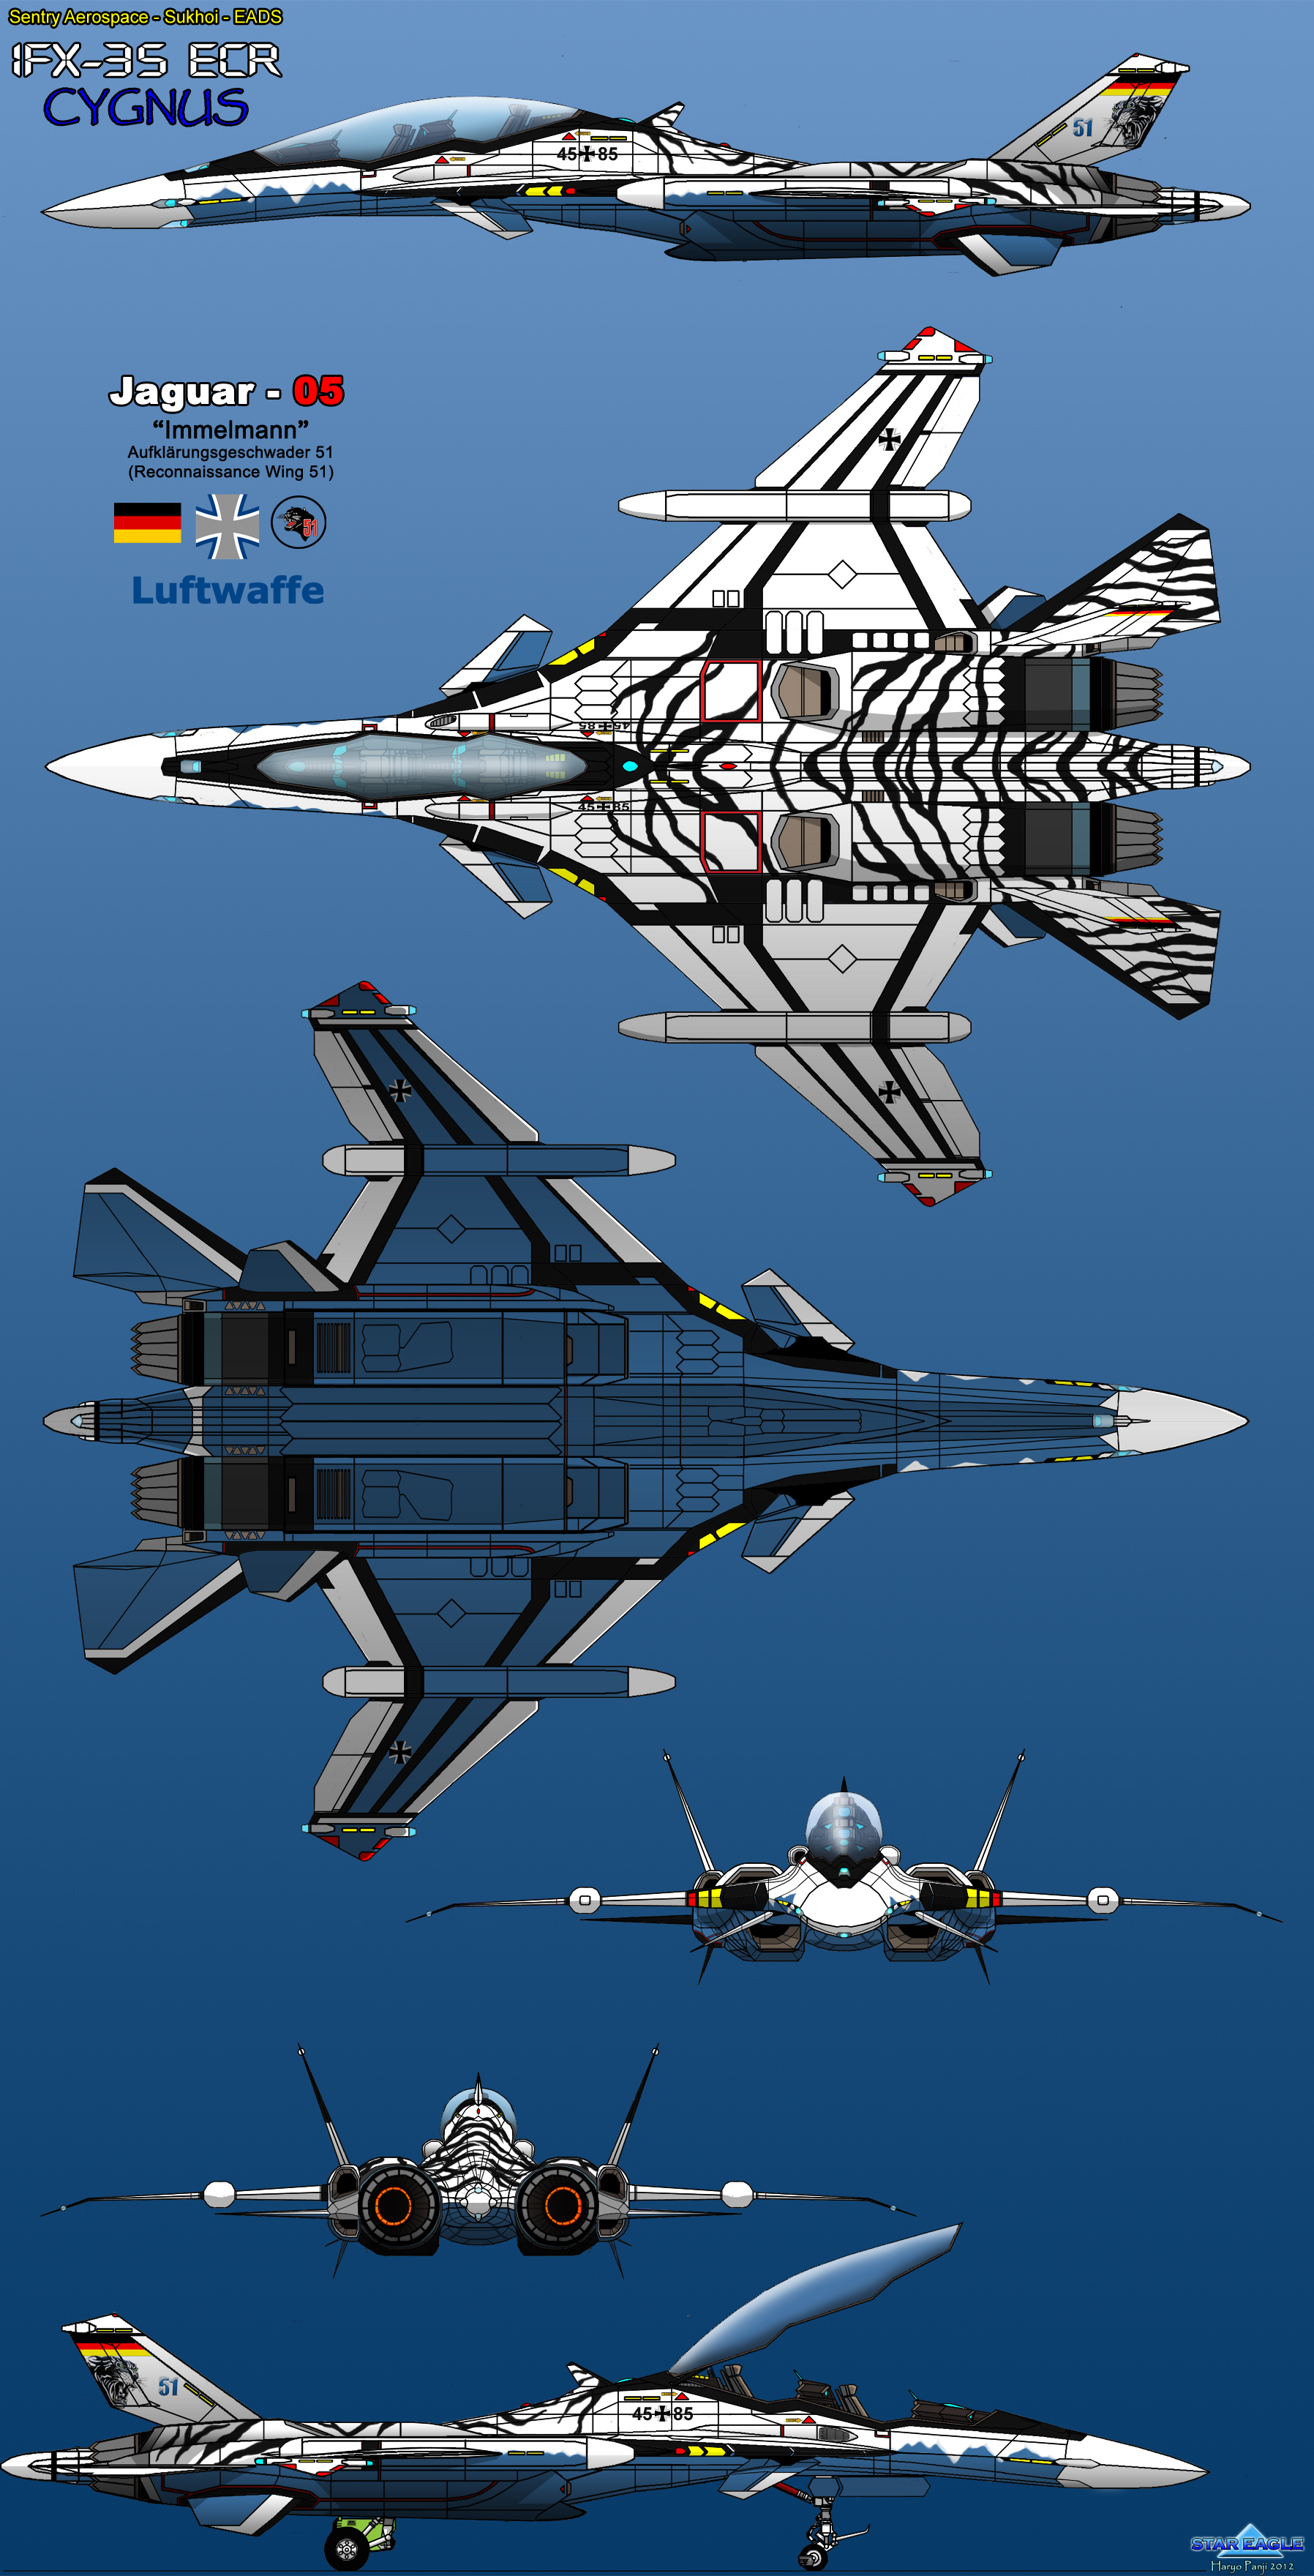 IFX-35 ECR Cygnus - Artic Tiger by haryopanji